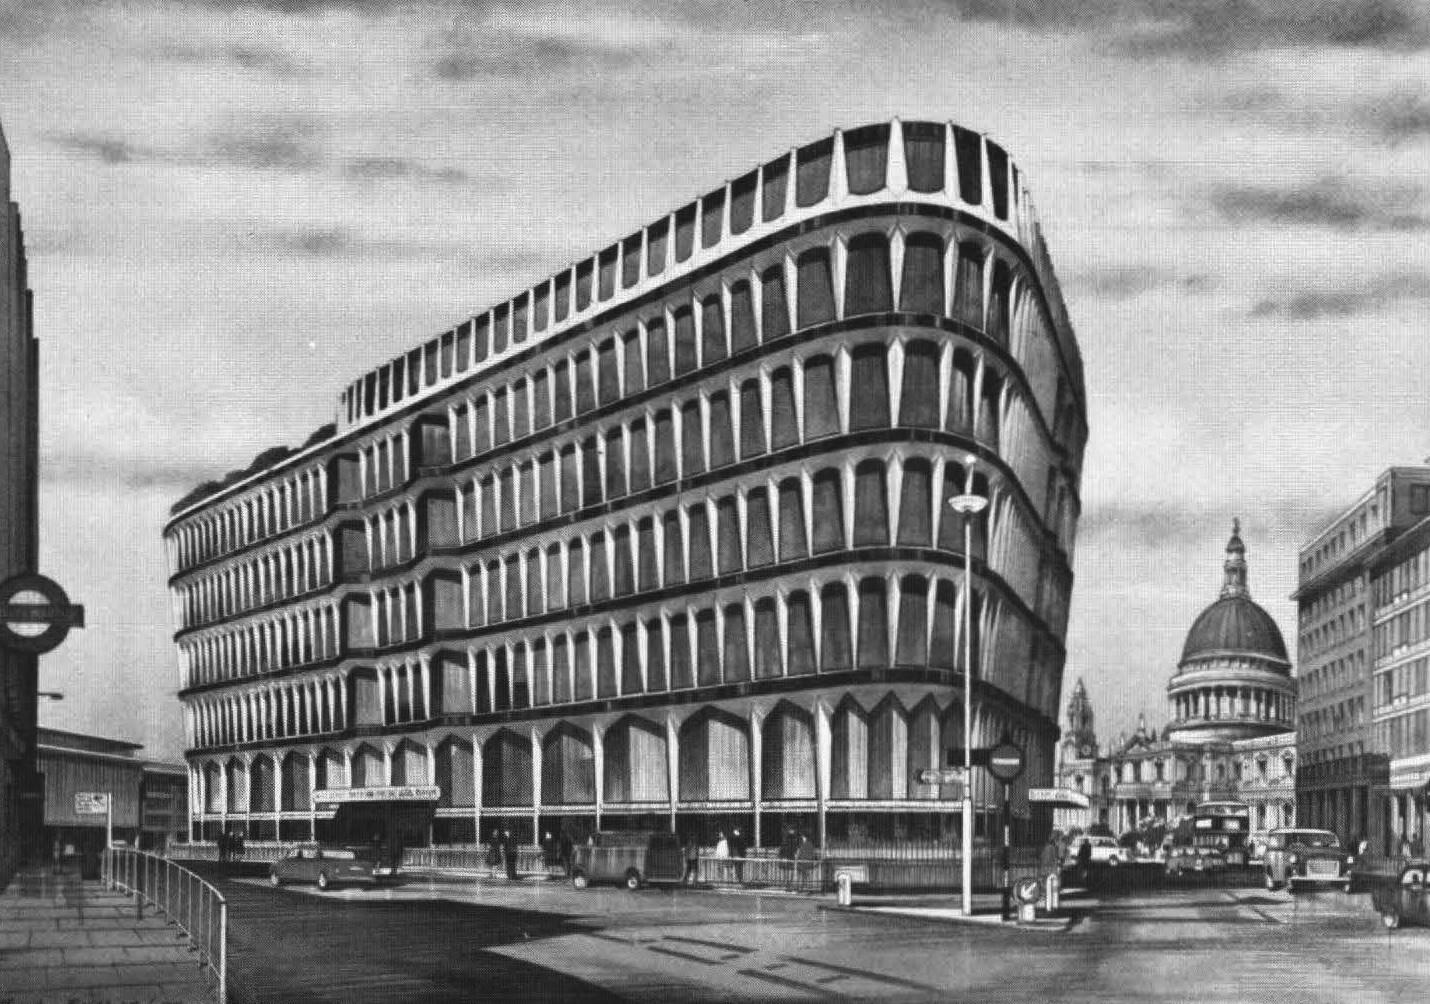 30 Cannon Street - History